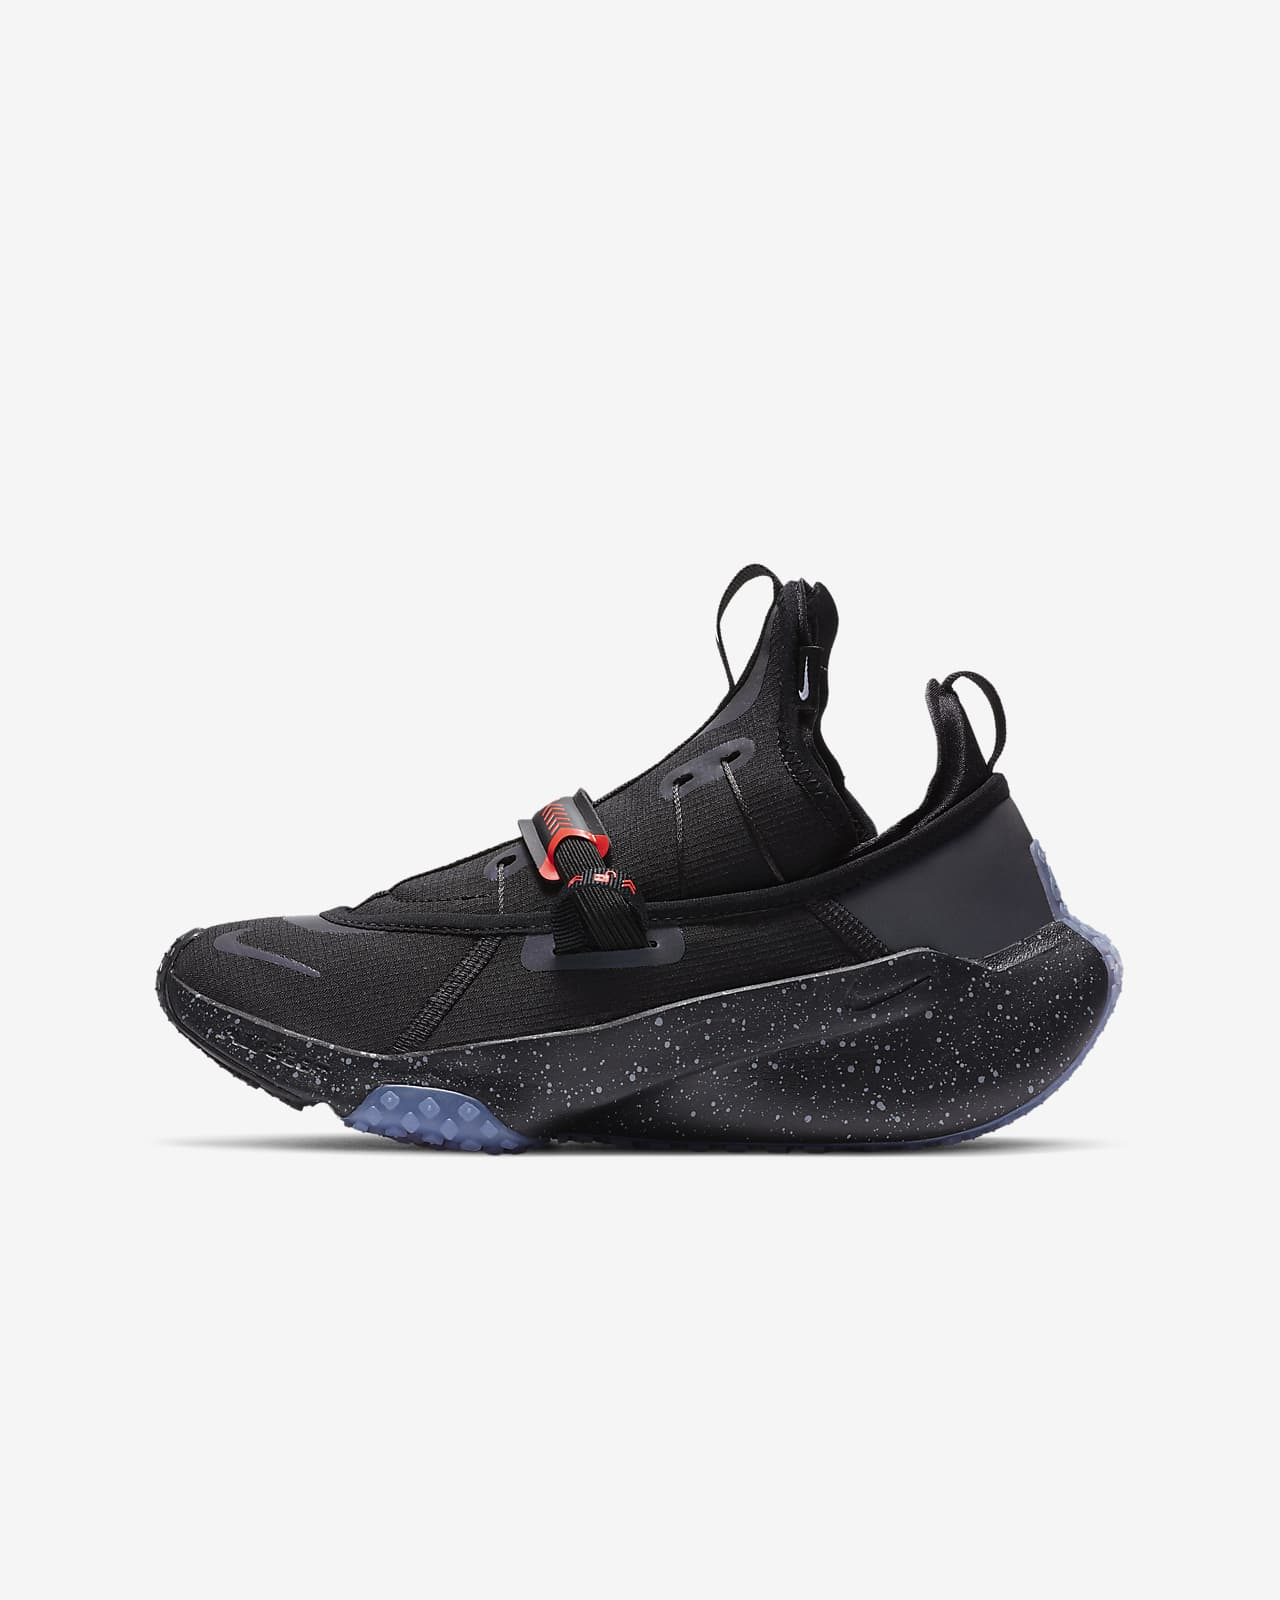 Nike Zoom Traverse Big Kids' Shoe